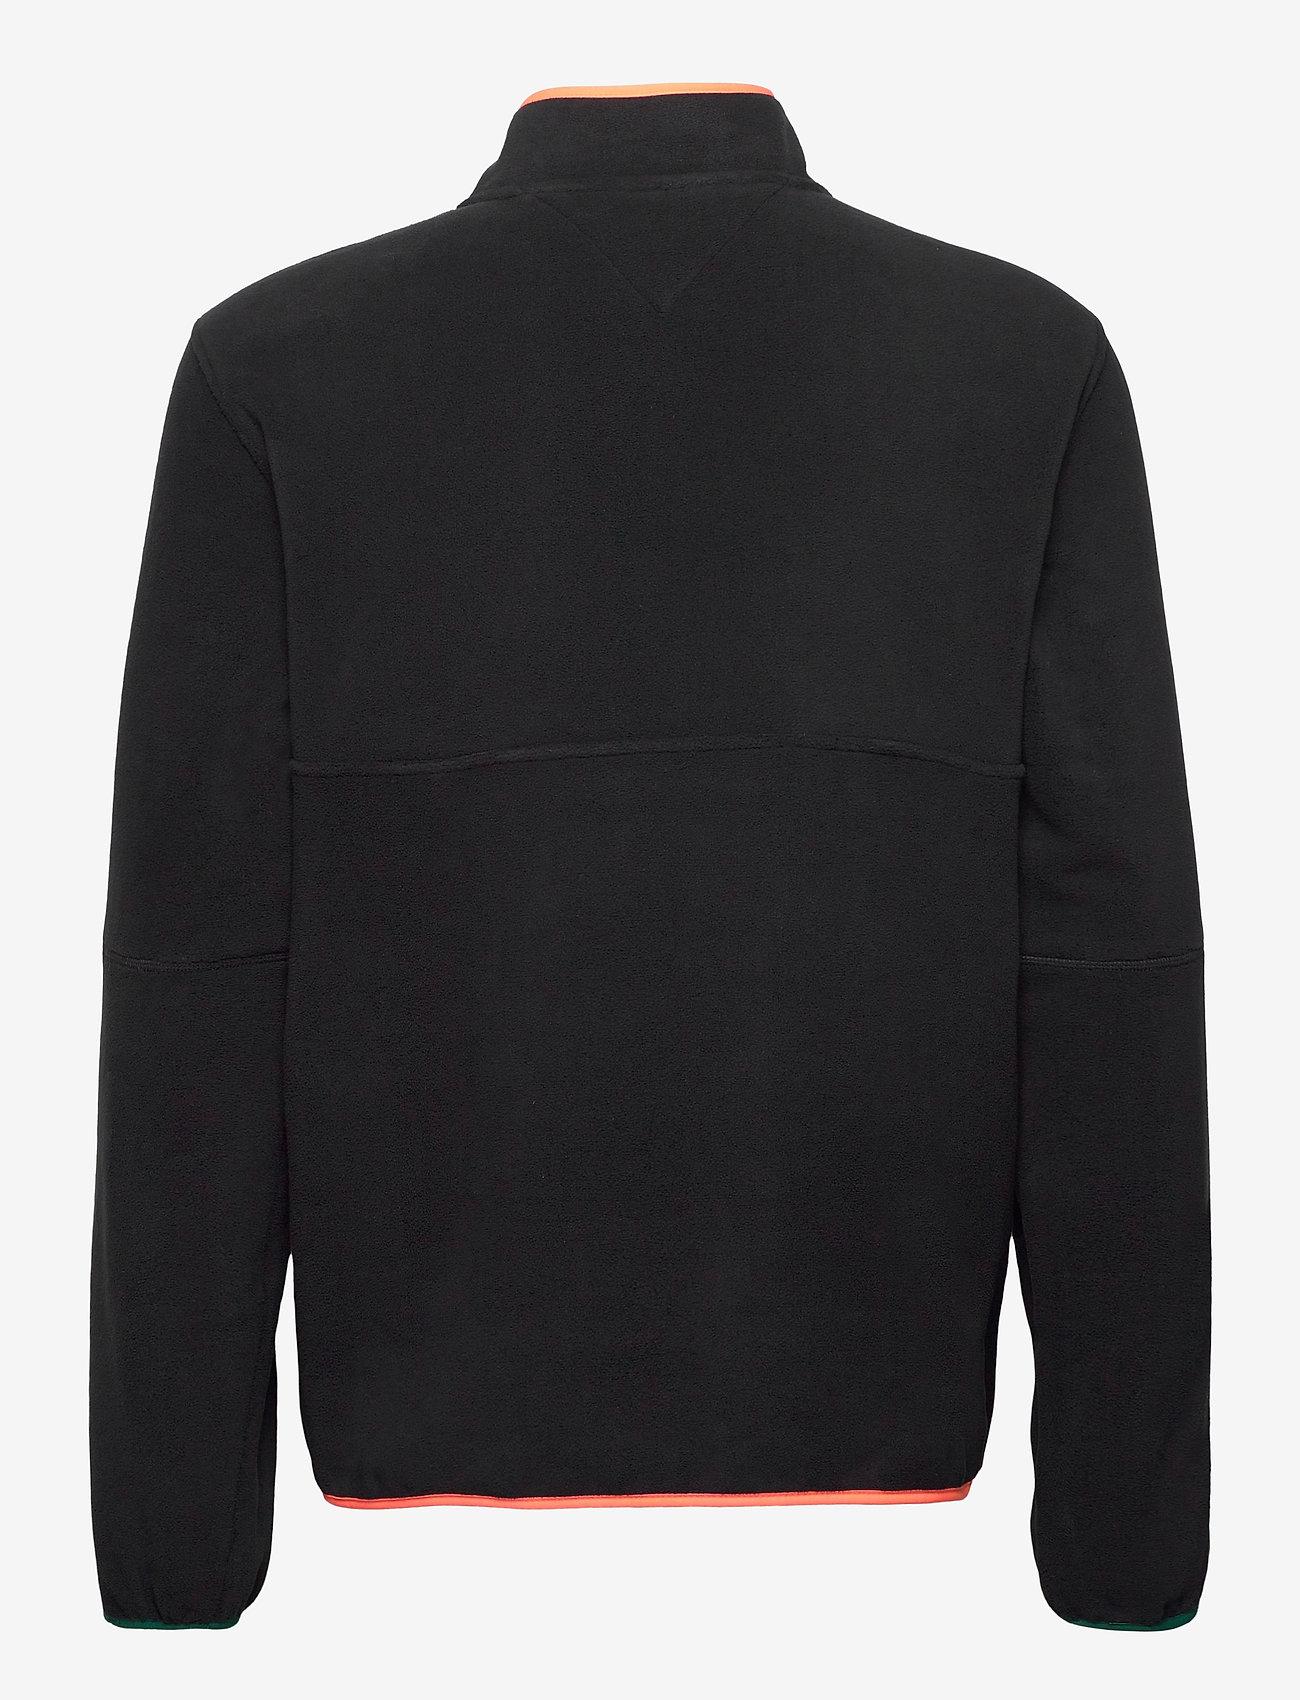 Tommy Jeans - TJM MIX FABRIC MOCK NECK C - basic-sweatshirts - black / multi - 1